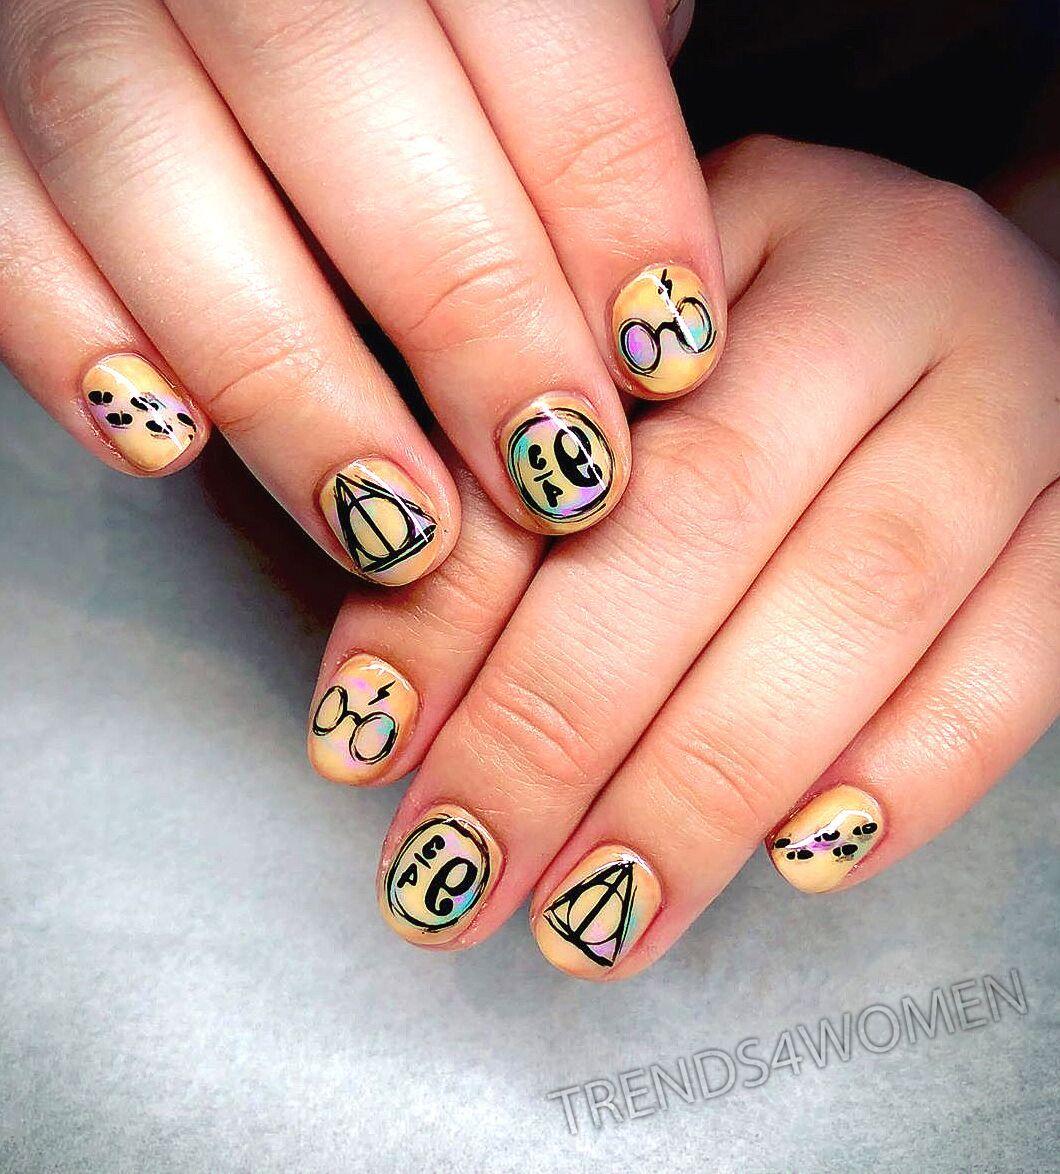 #nails #nailart #nailsofinstagram #nailpromote #nailtech #follownails #nailinspo #naillove #manicure #nailsoftheday #instanails #nailitdaily #art #naildesign #nailartclub #showscratch #nailsmagazine #gelnails #gelpolish #nailtech #nailartist #rednails #harrypotter #harrypotternails #harrypotterart #harrypotterfans #hpnailart #deathlyhallows #hogwarts #nailinspo